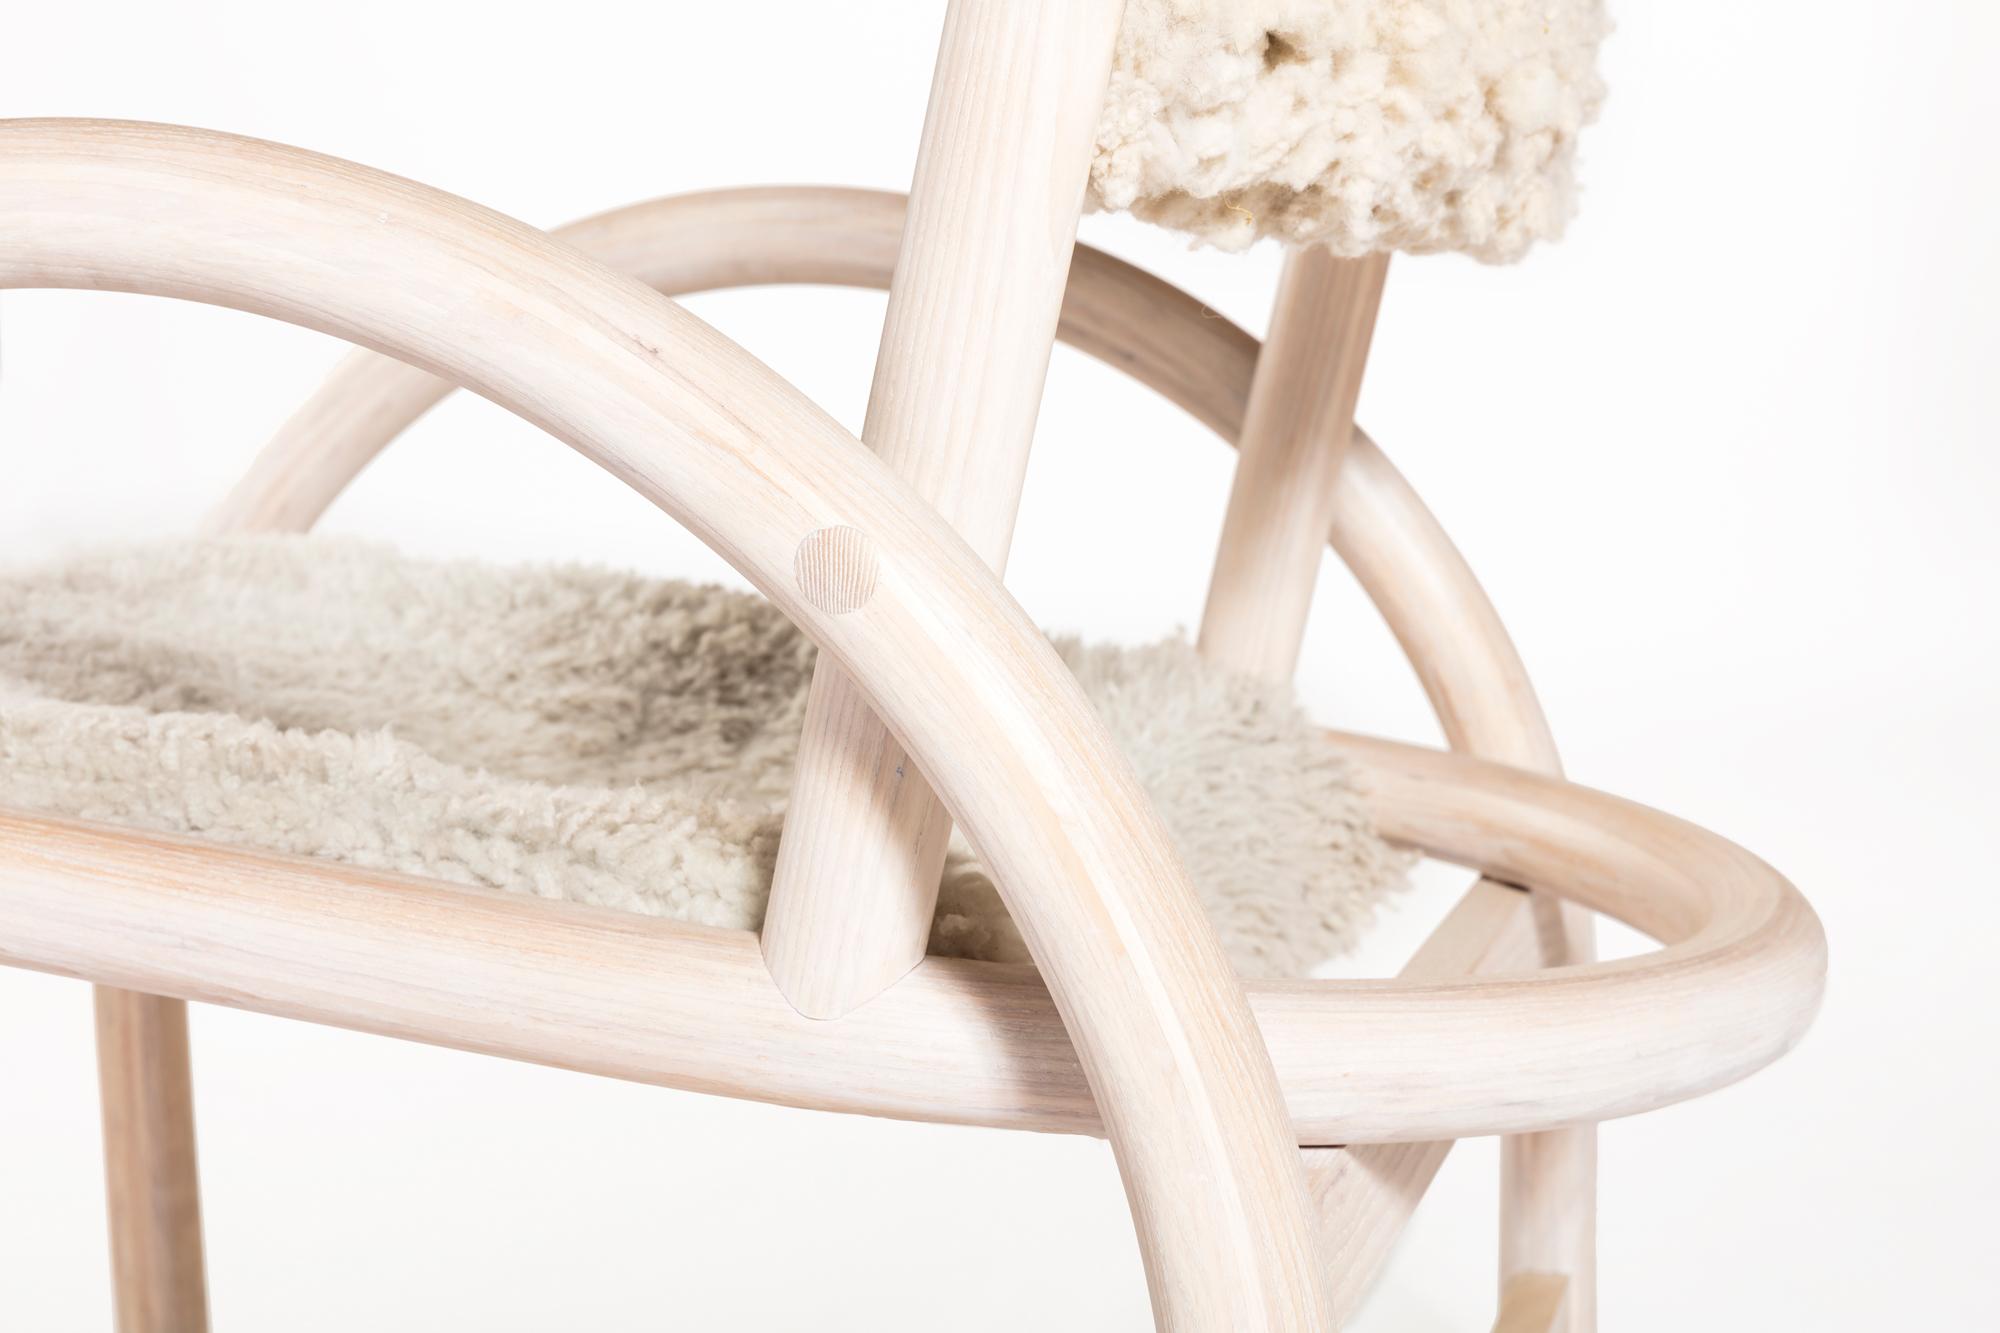 Shepherd's Chair side detail